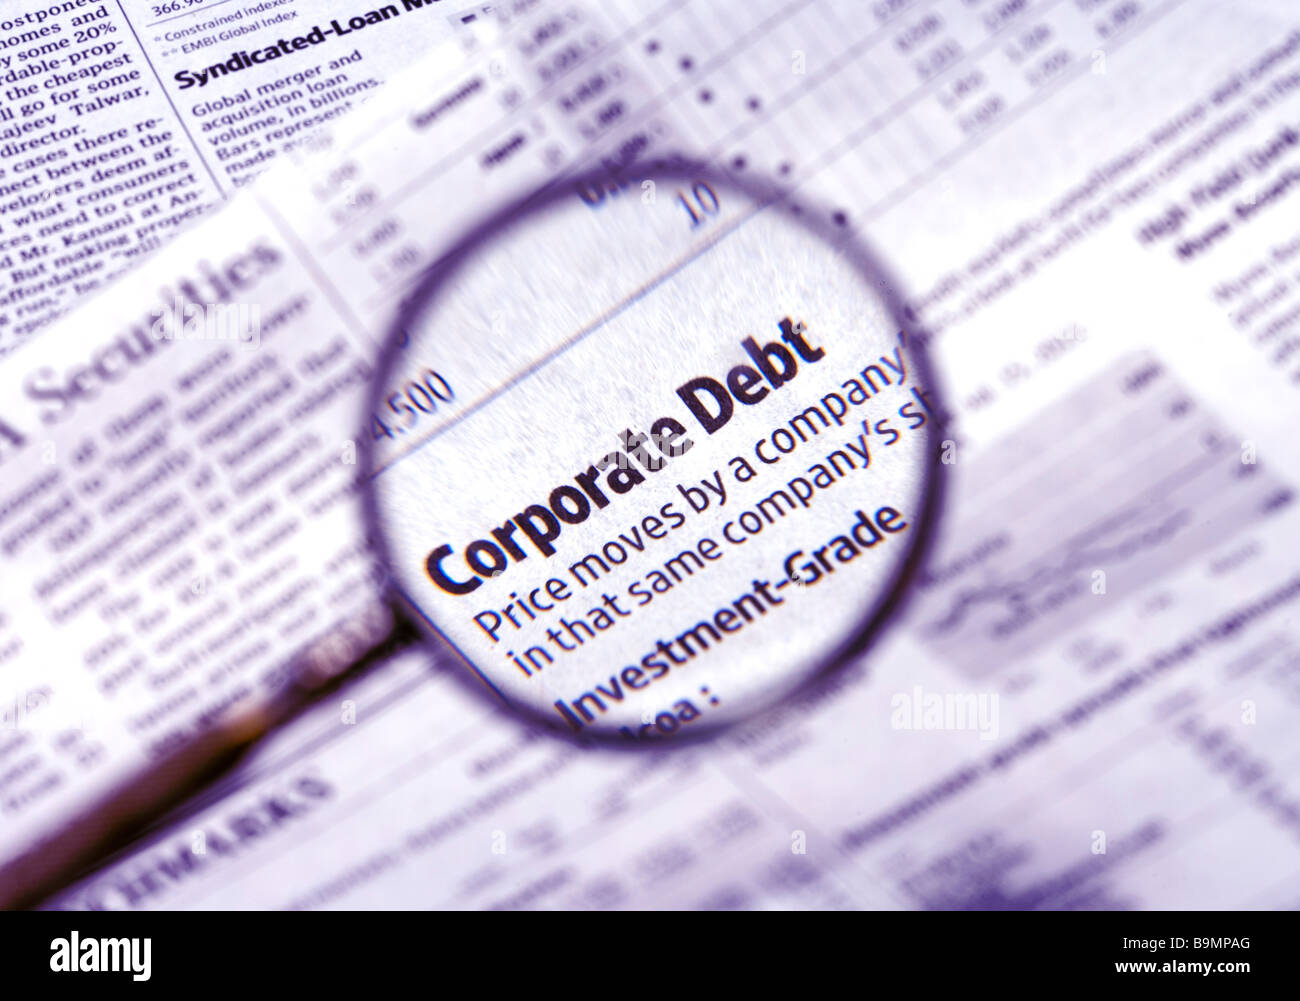 Focus on corporate debt. - Stock Image